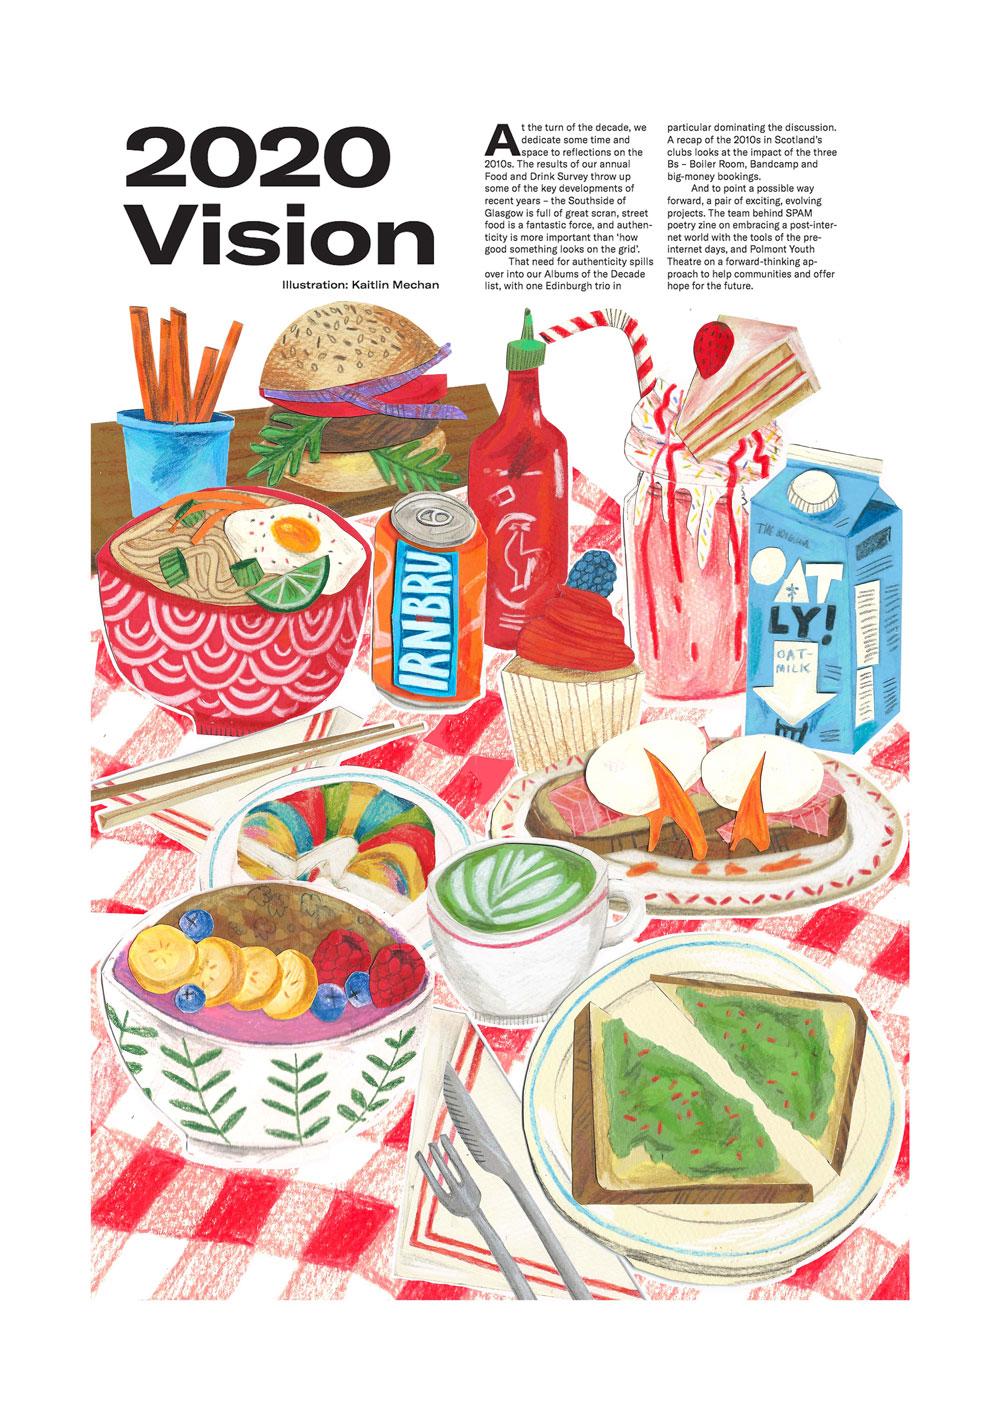 Kaitlin Mechan food illustration